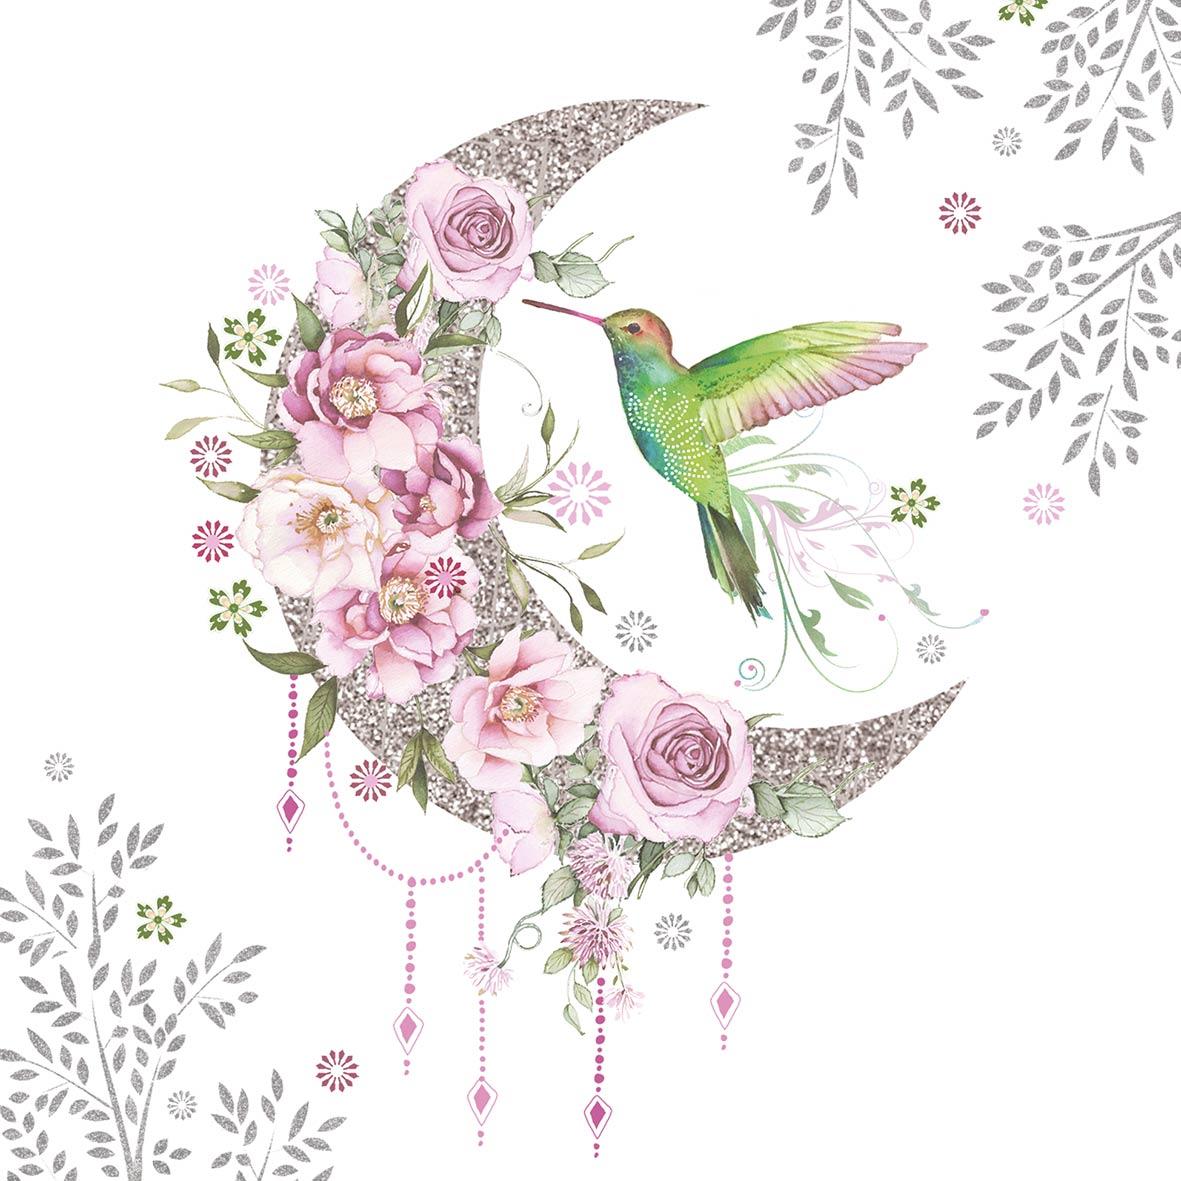 Hummingbird Moon 33x33 cm